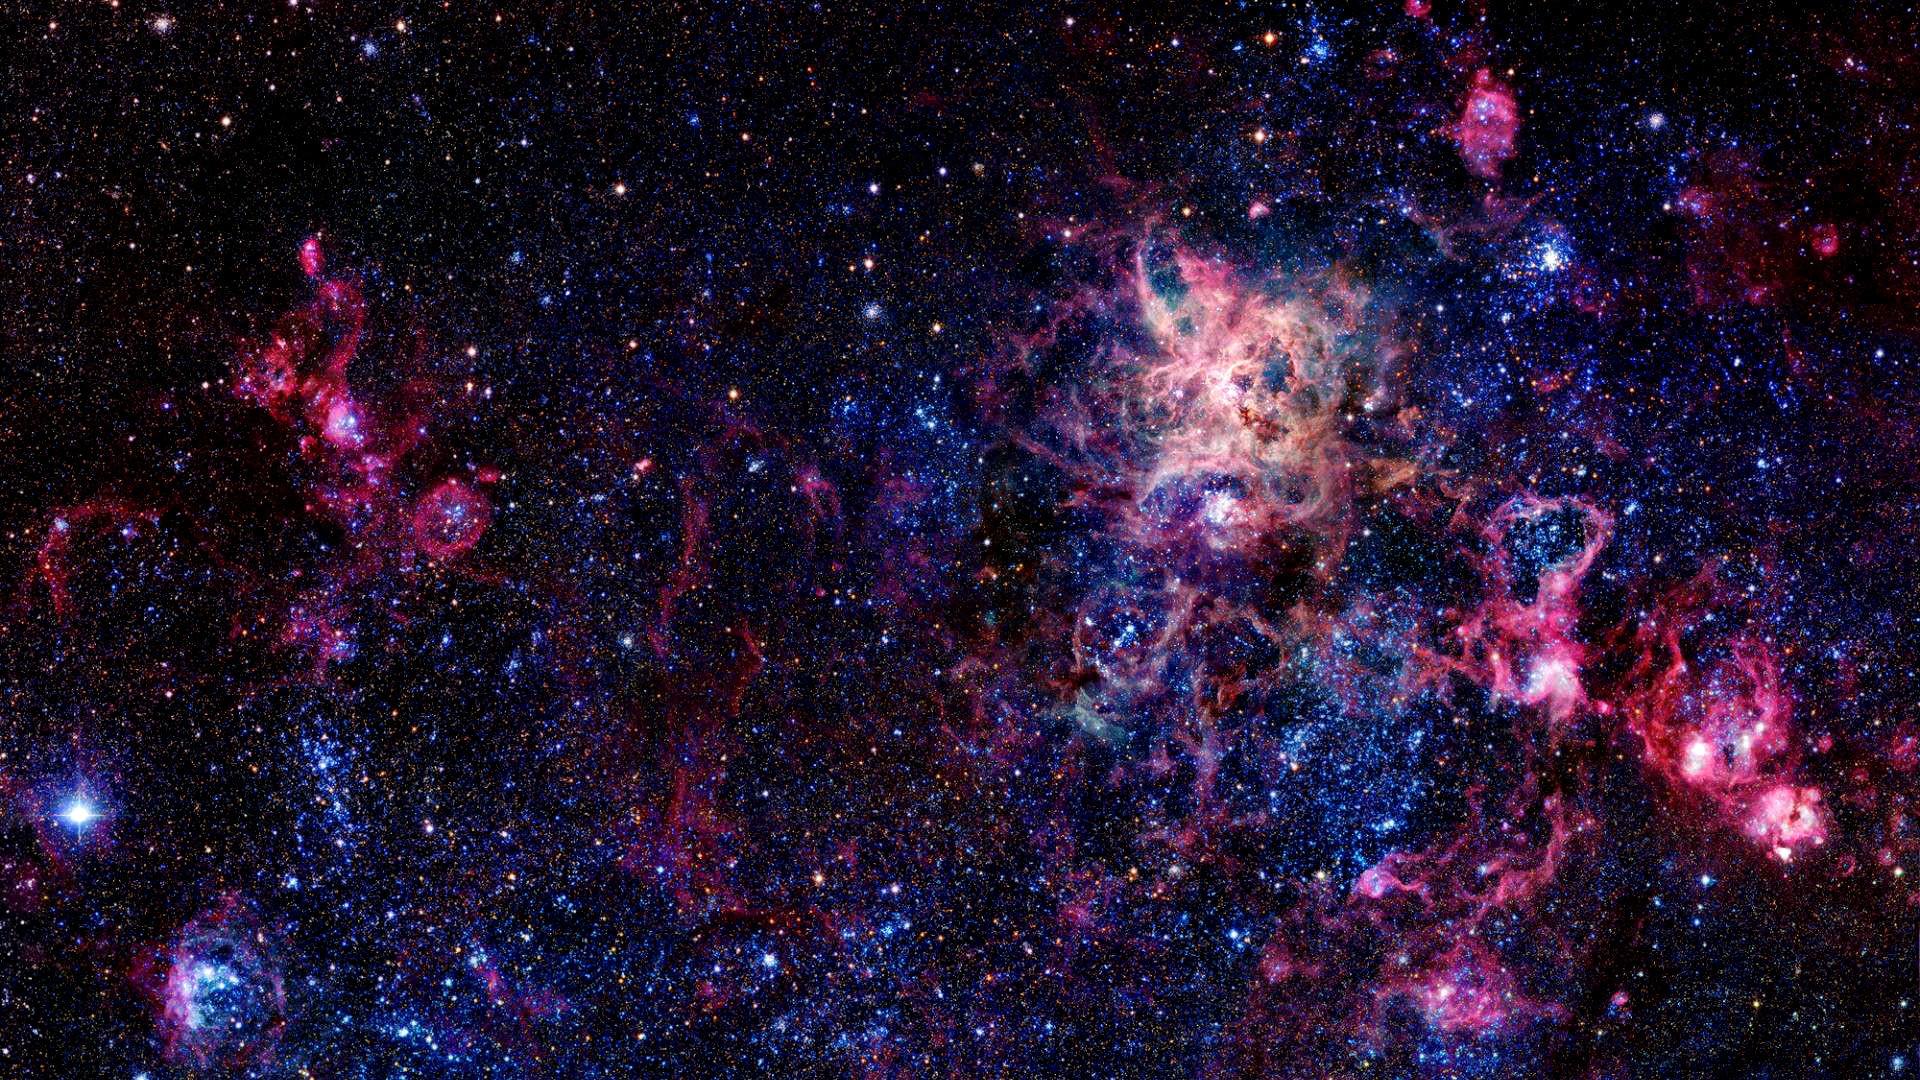 HD Wallpapers   Pinterest   Cosmos, Hd wallpaper and Wallpaper